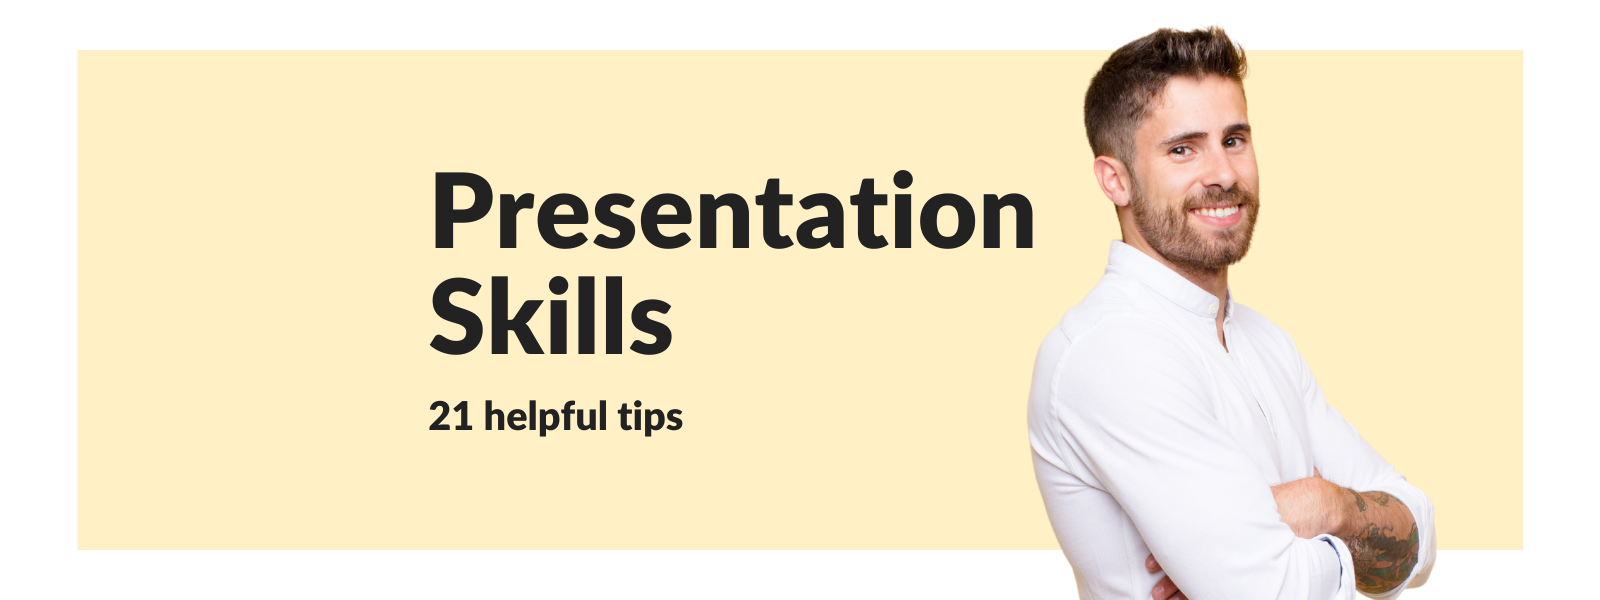 Tips to improve presentation skills - Talaera